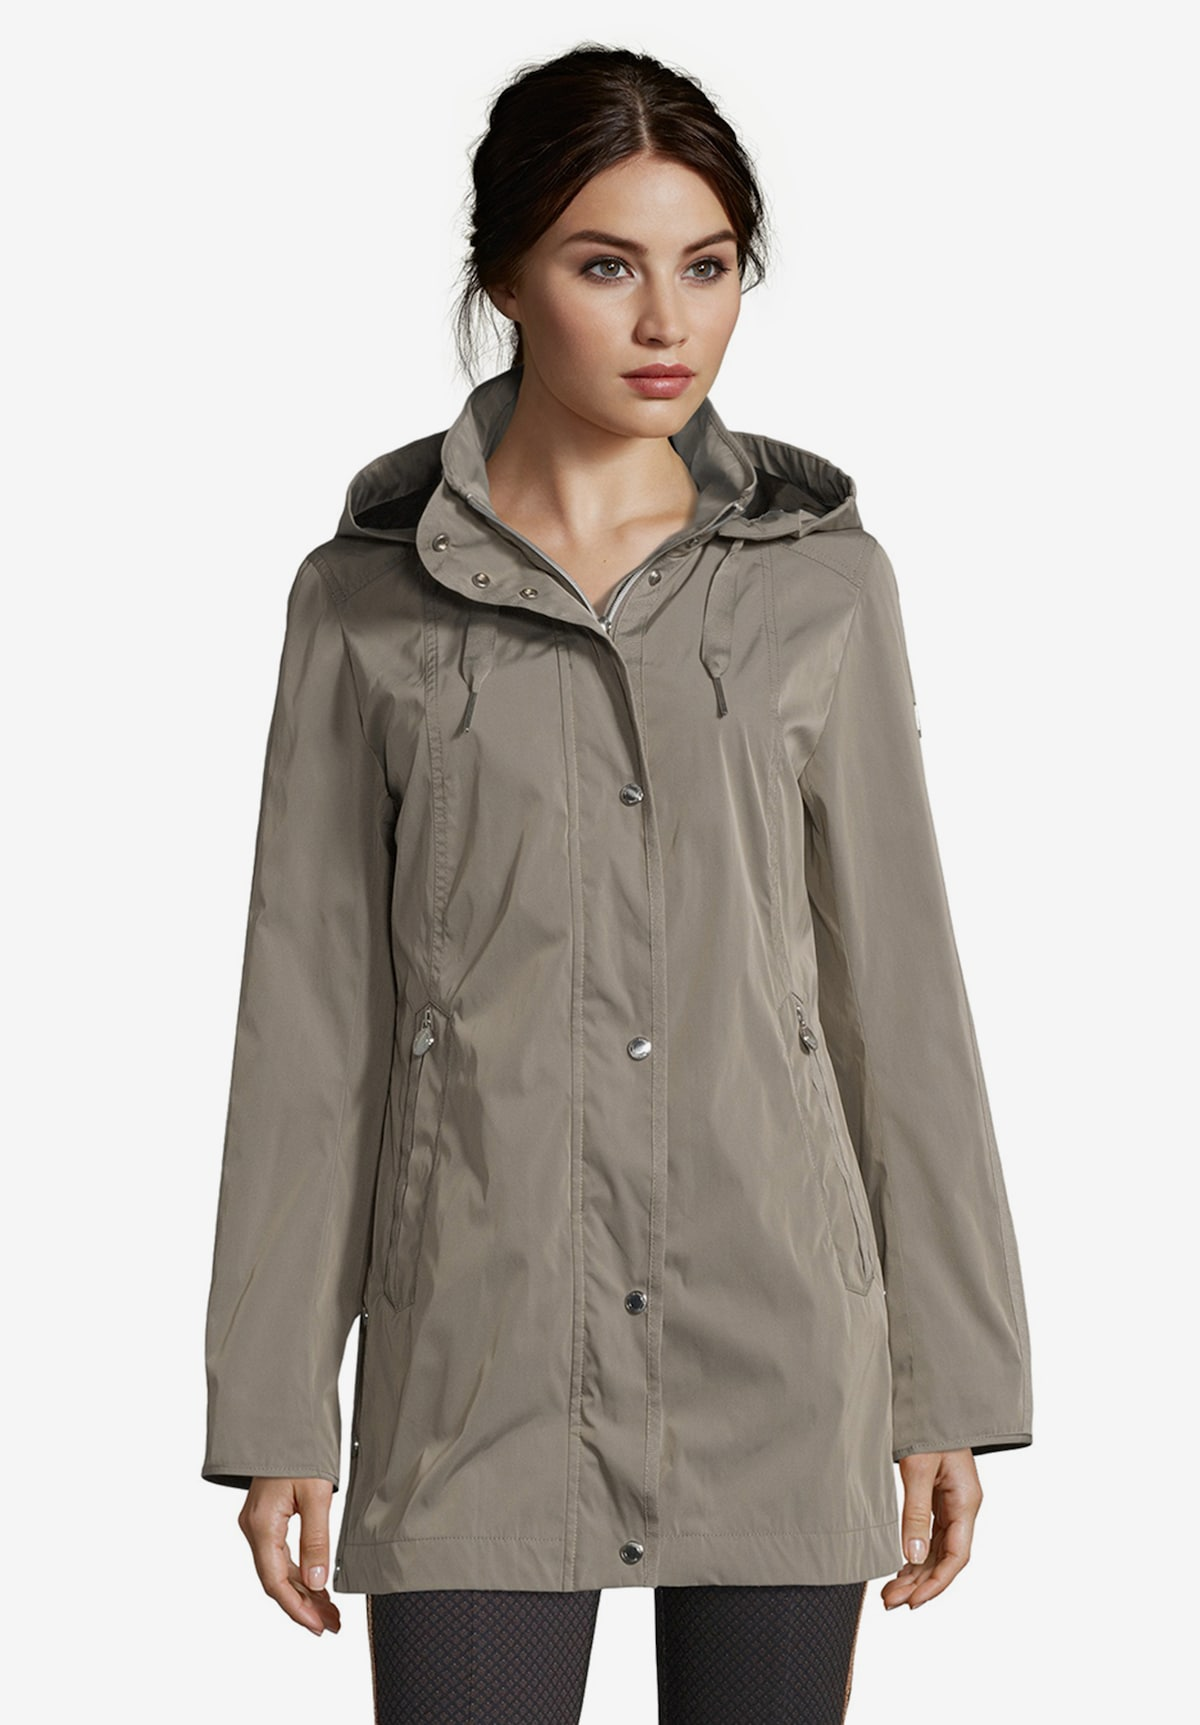 Beliebt Frauen Bekleidung Betty Barclay Outdoorjacke mit abnehmbarer Kapuze in khaki Zum Verkauf